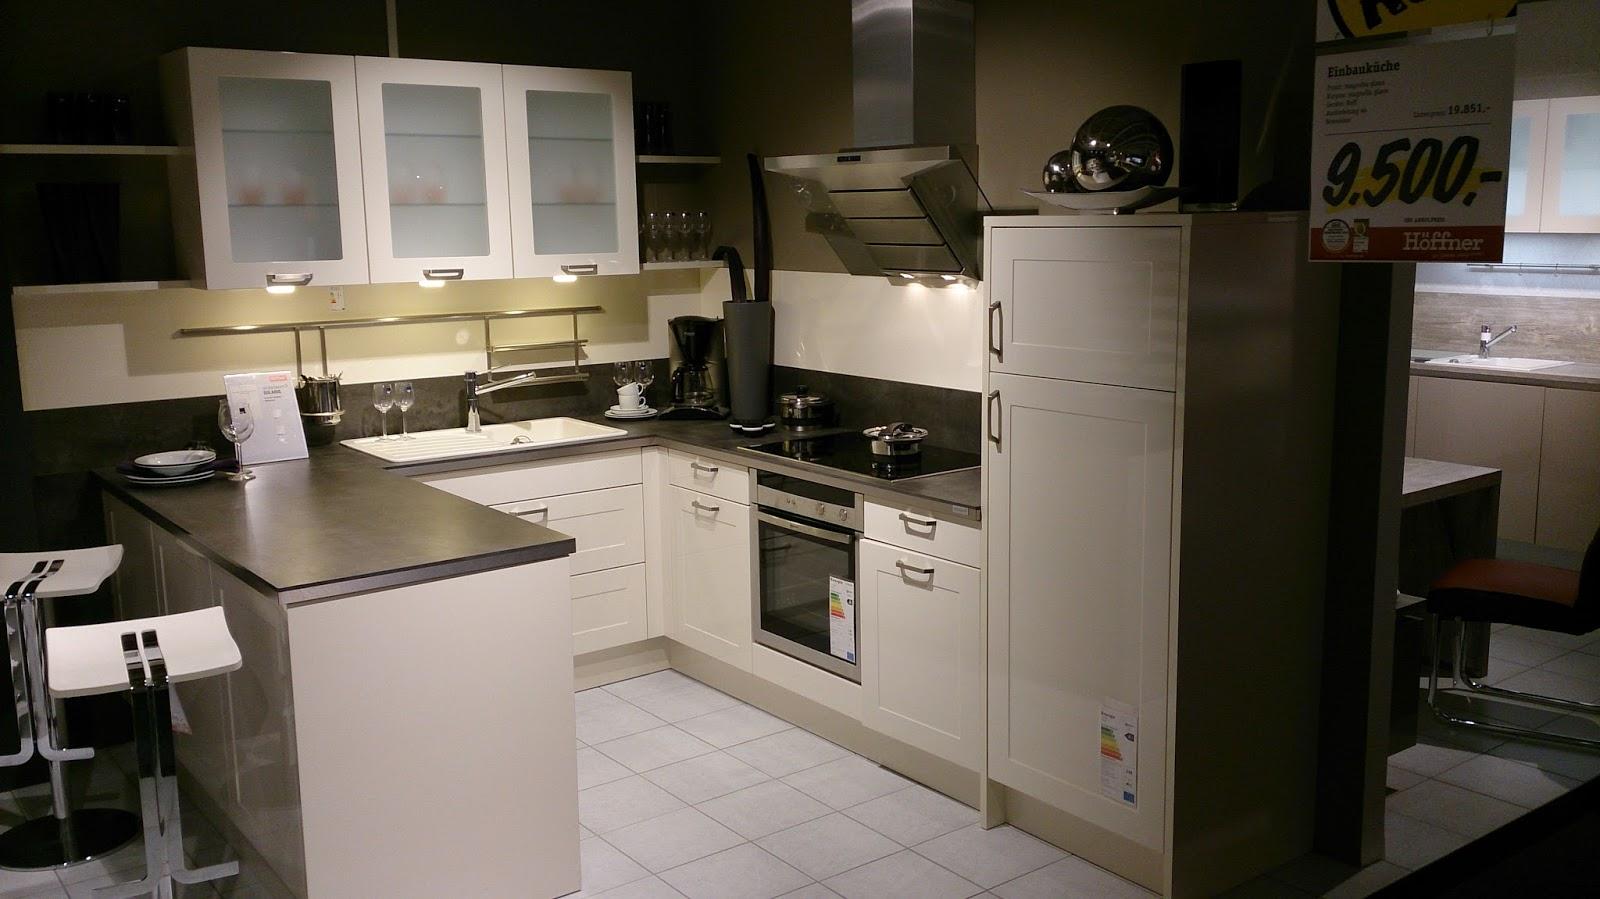 k chen aktuell service center neuss de haus. Black Bedroom Furniture Sets. Home Design Ideas